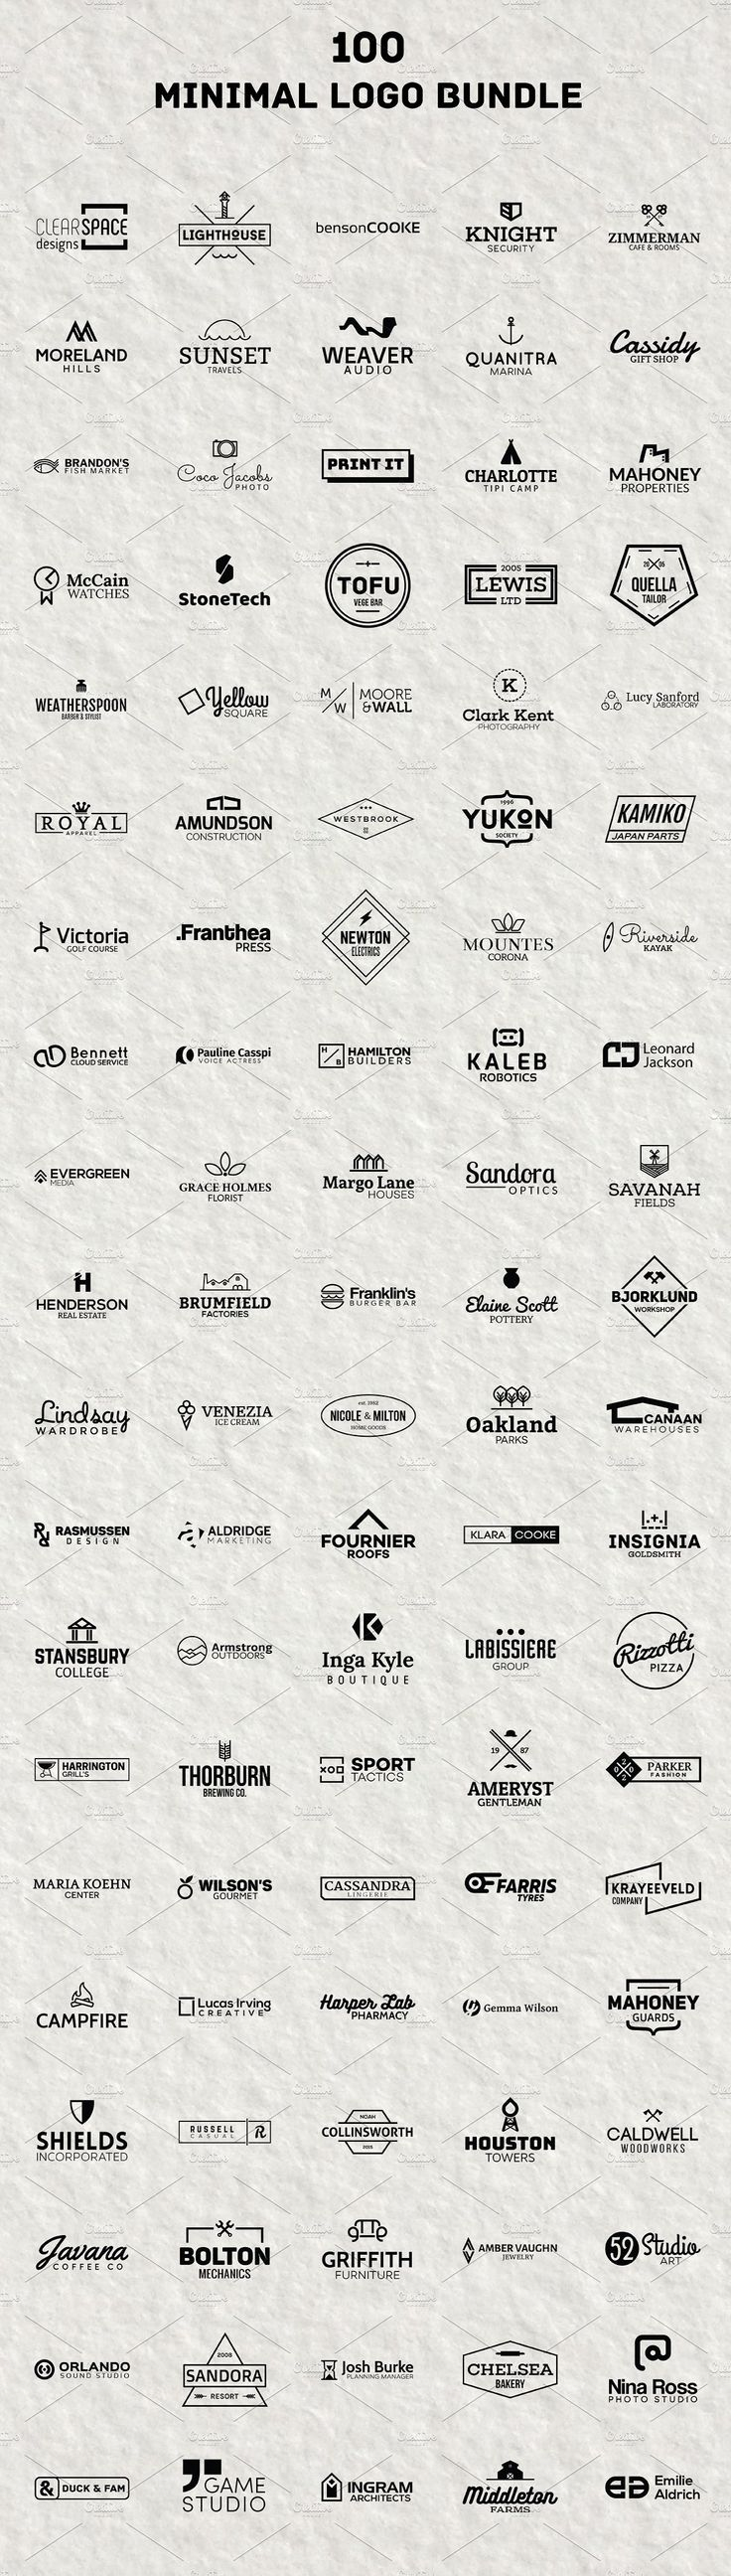 100 Minimal Logo - BUNDLE by BART.Co Design on @creativemarket